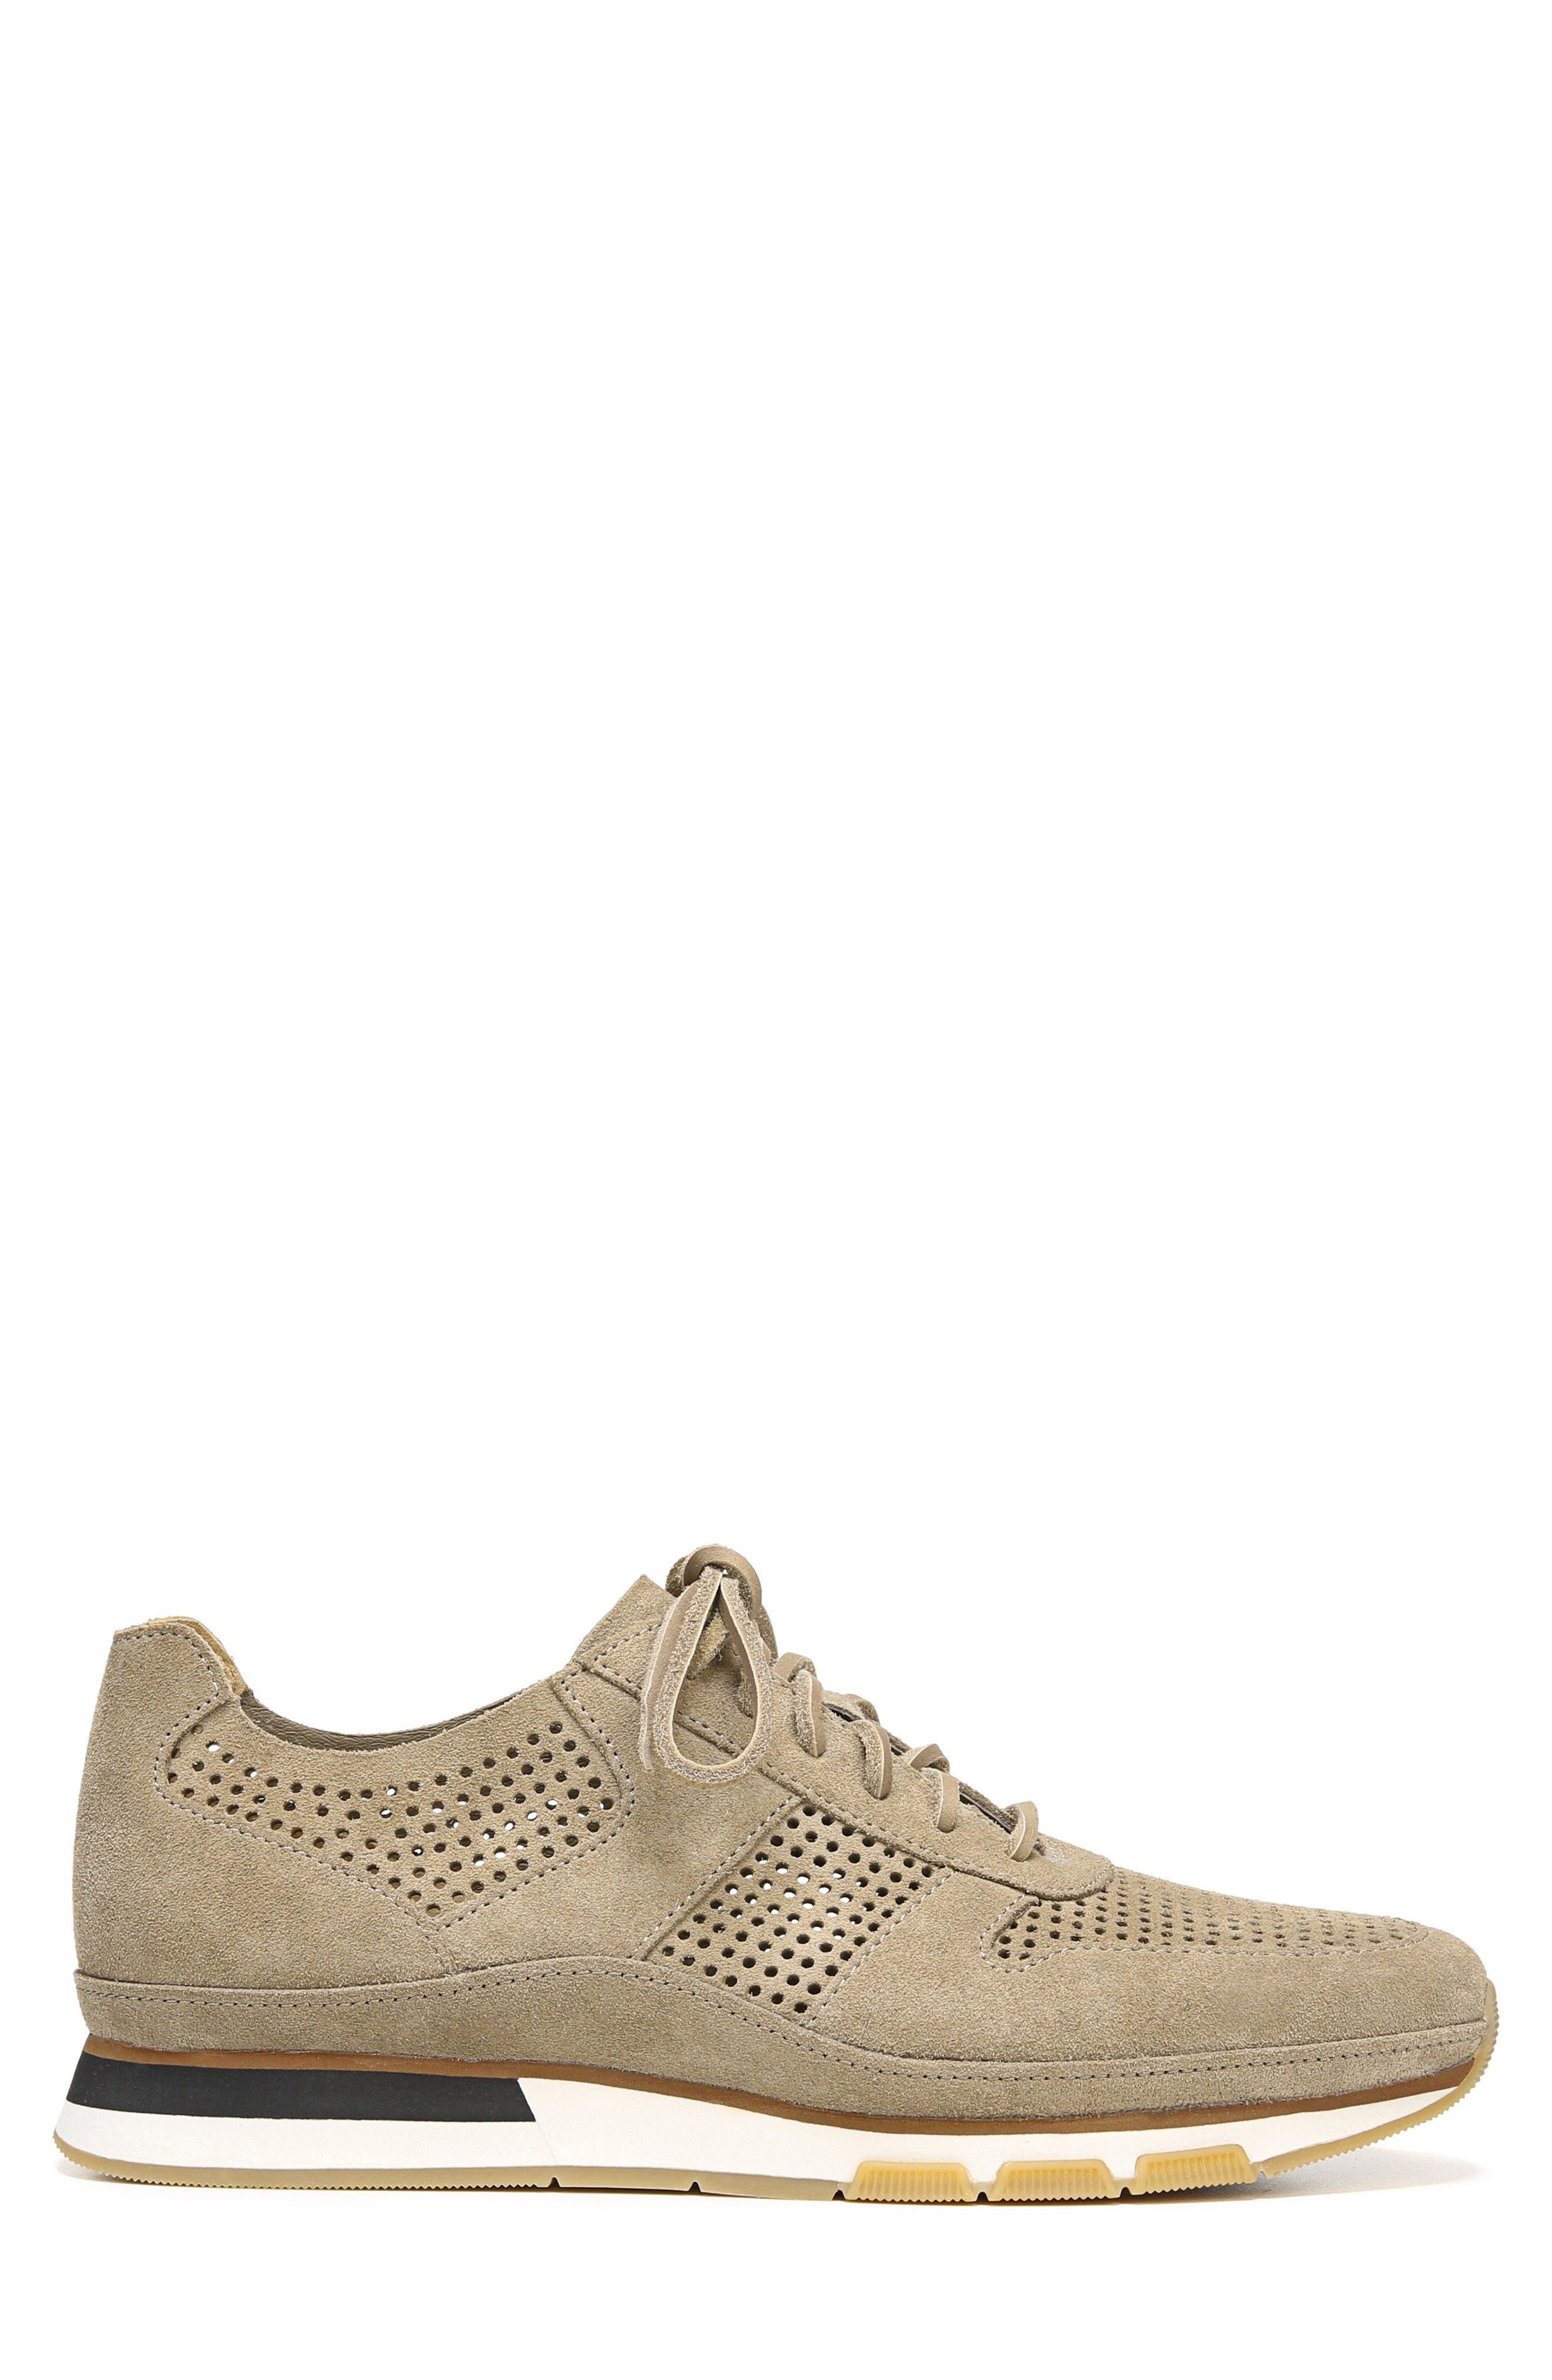 Larson Perforated Sneaker,                             Alternate thumbnail 3, color,                             250